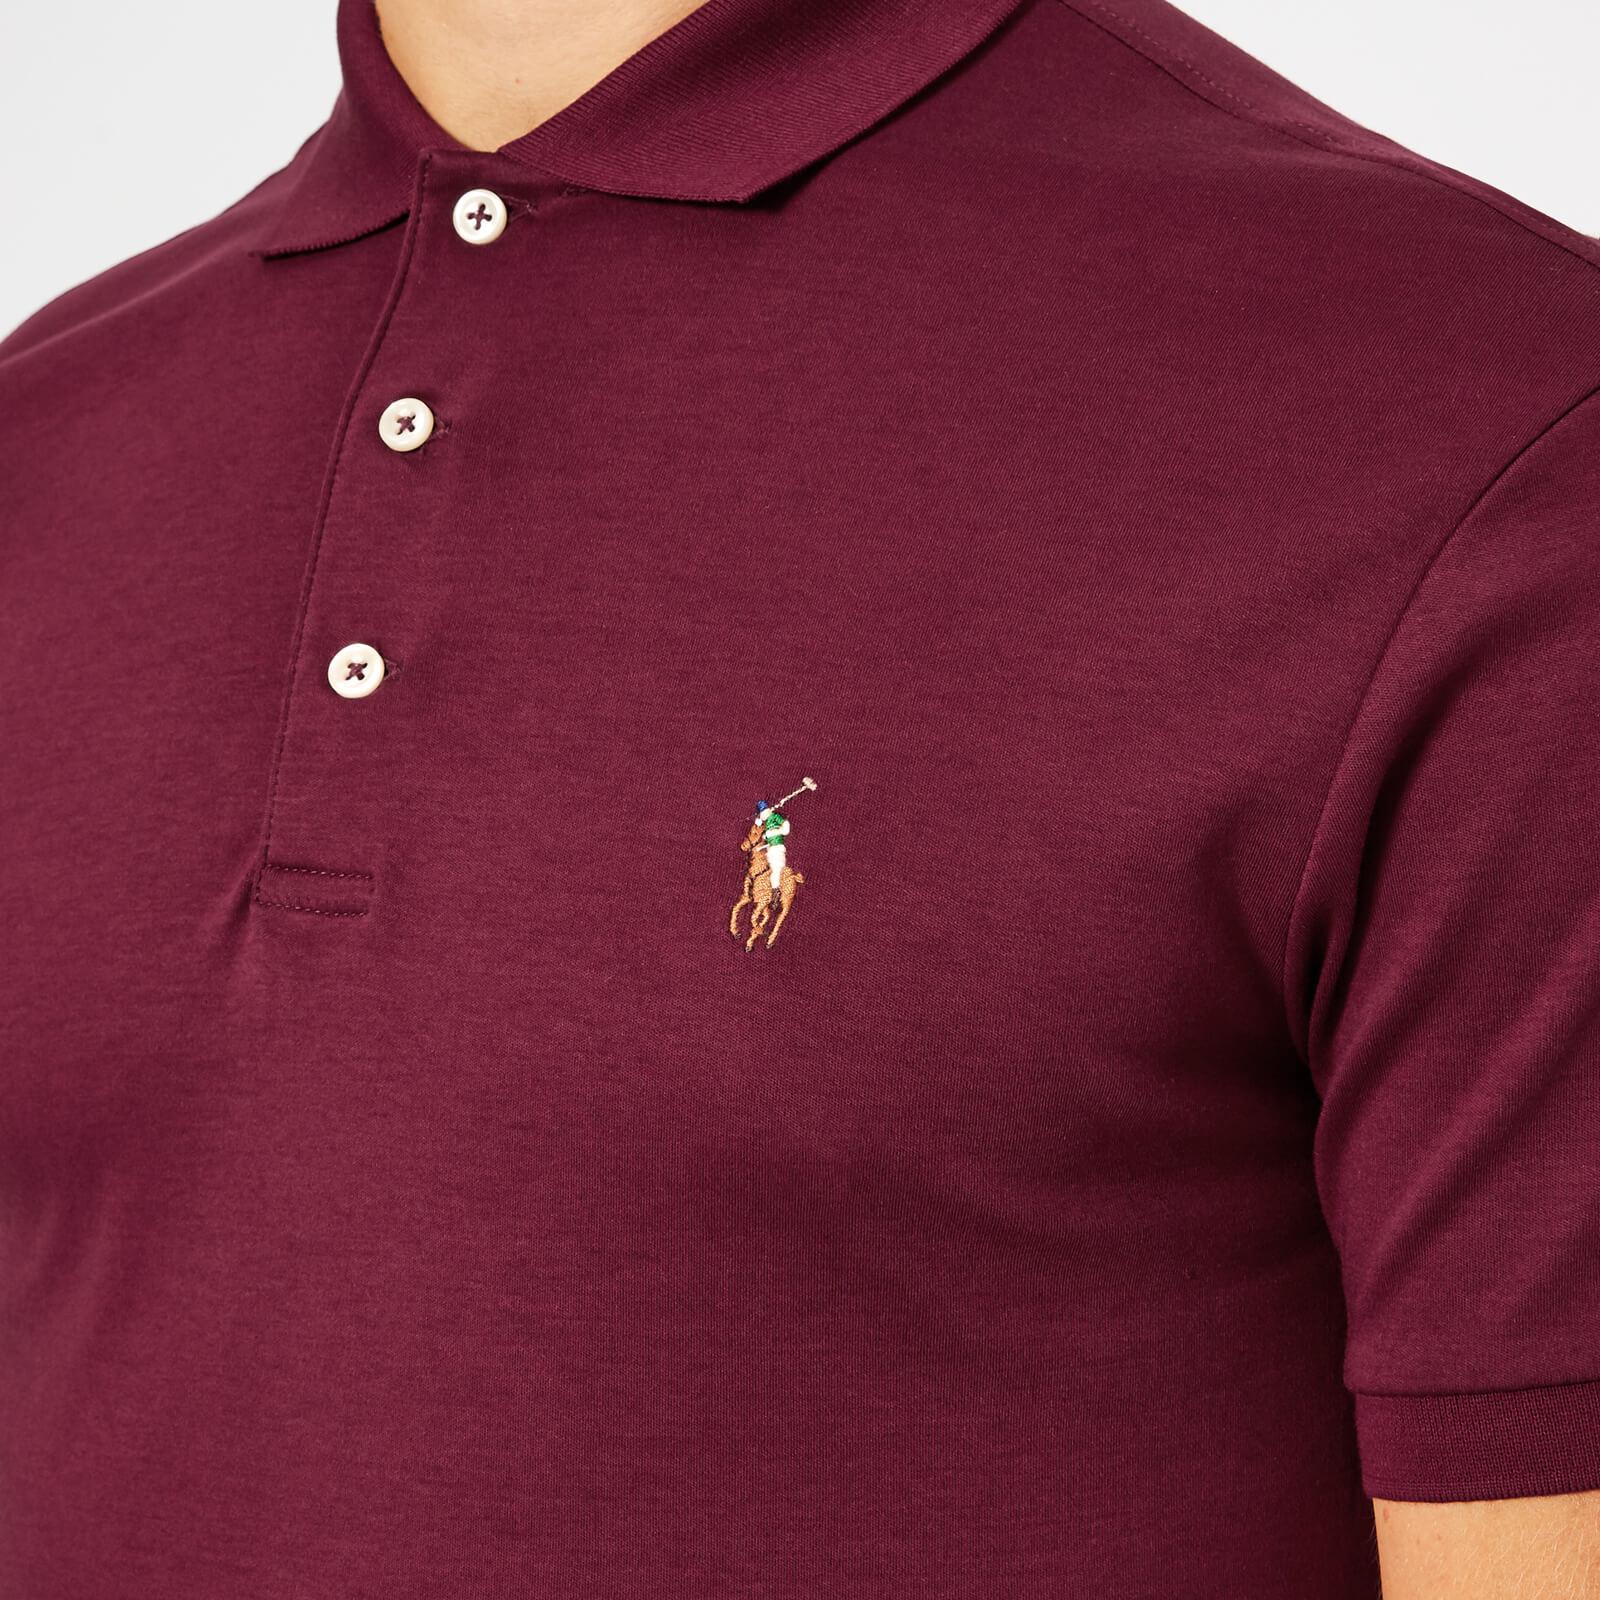 Ralph Lauren Men/'s Short Sleeve Custom Fit Logo Pique Polo Shirt $0 Free Ship